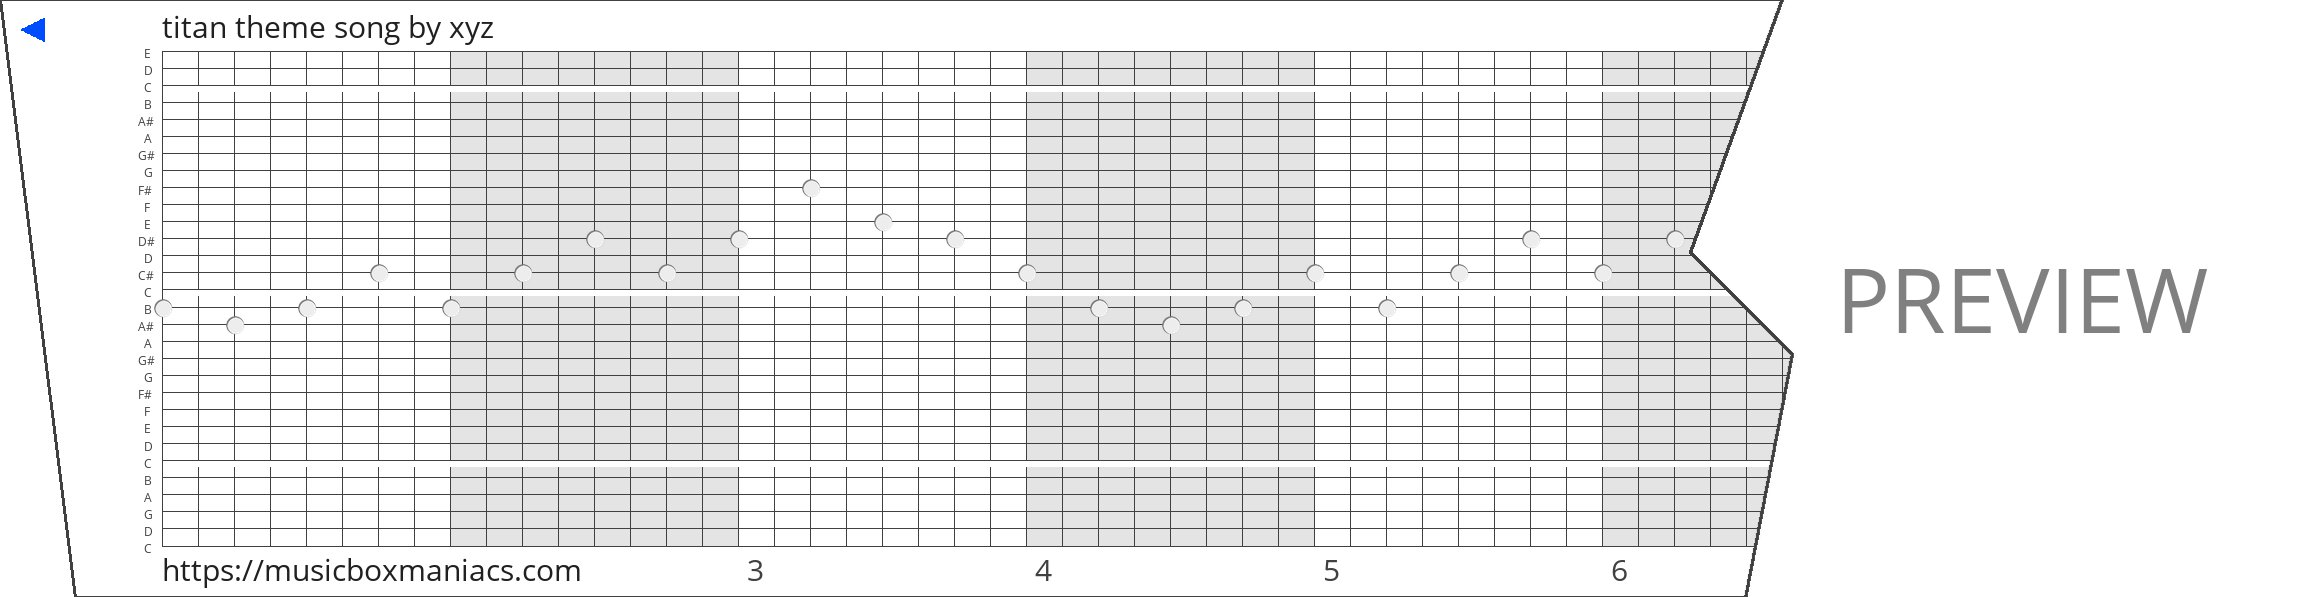 titan theme song 30 note music box paper strip